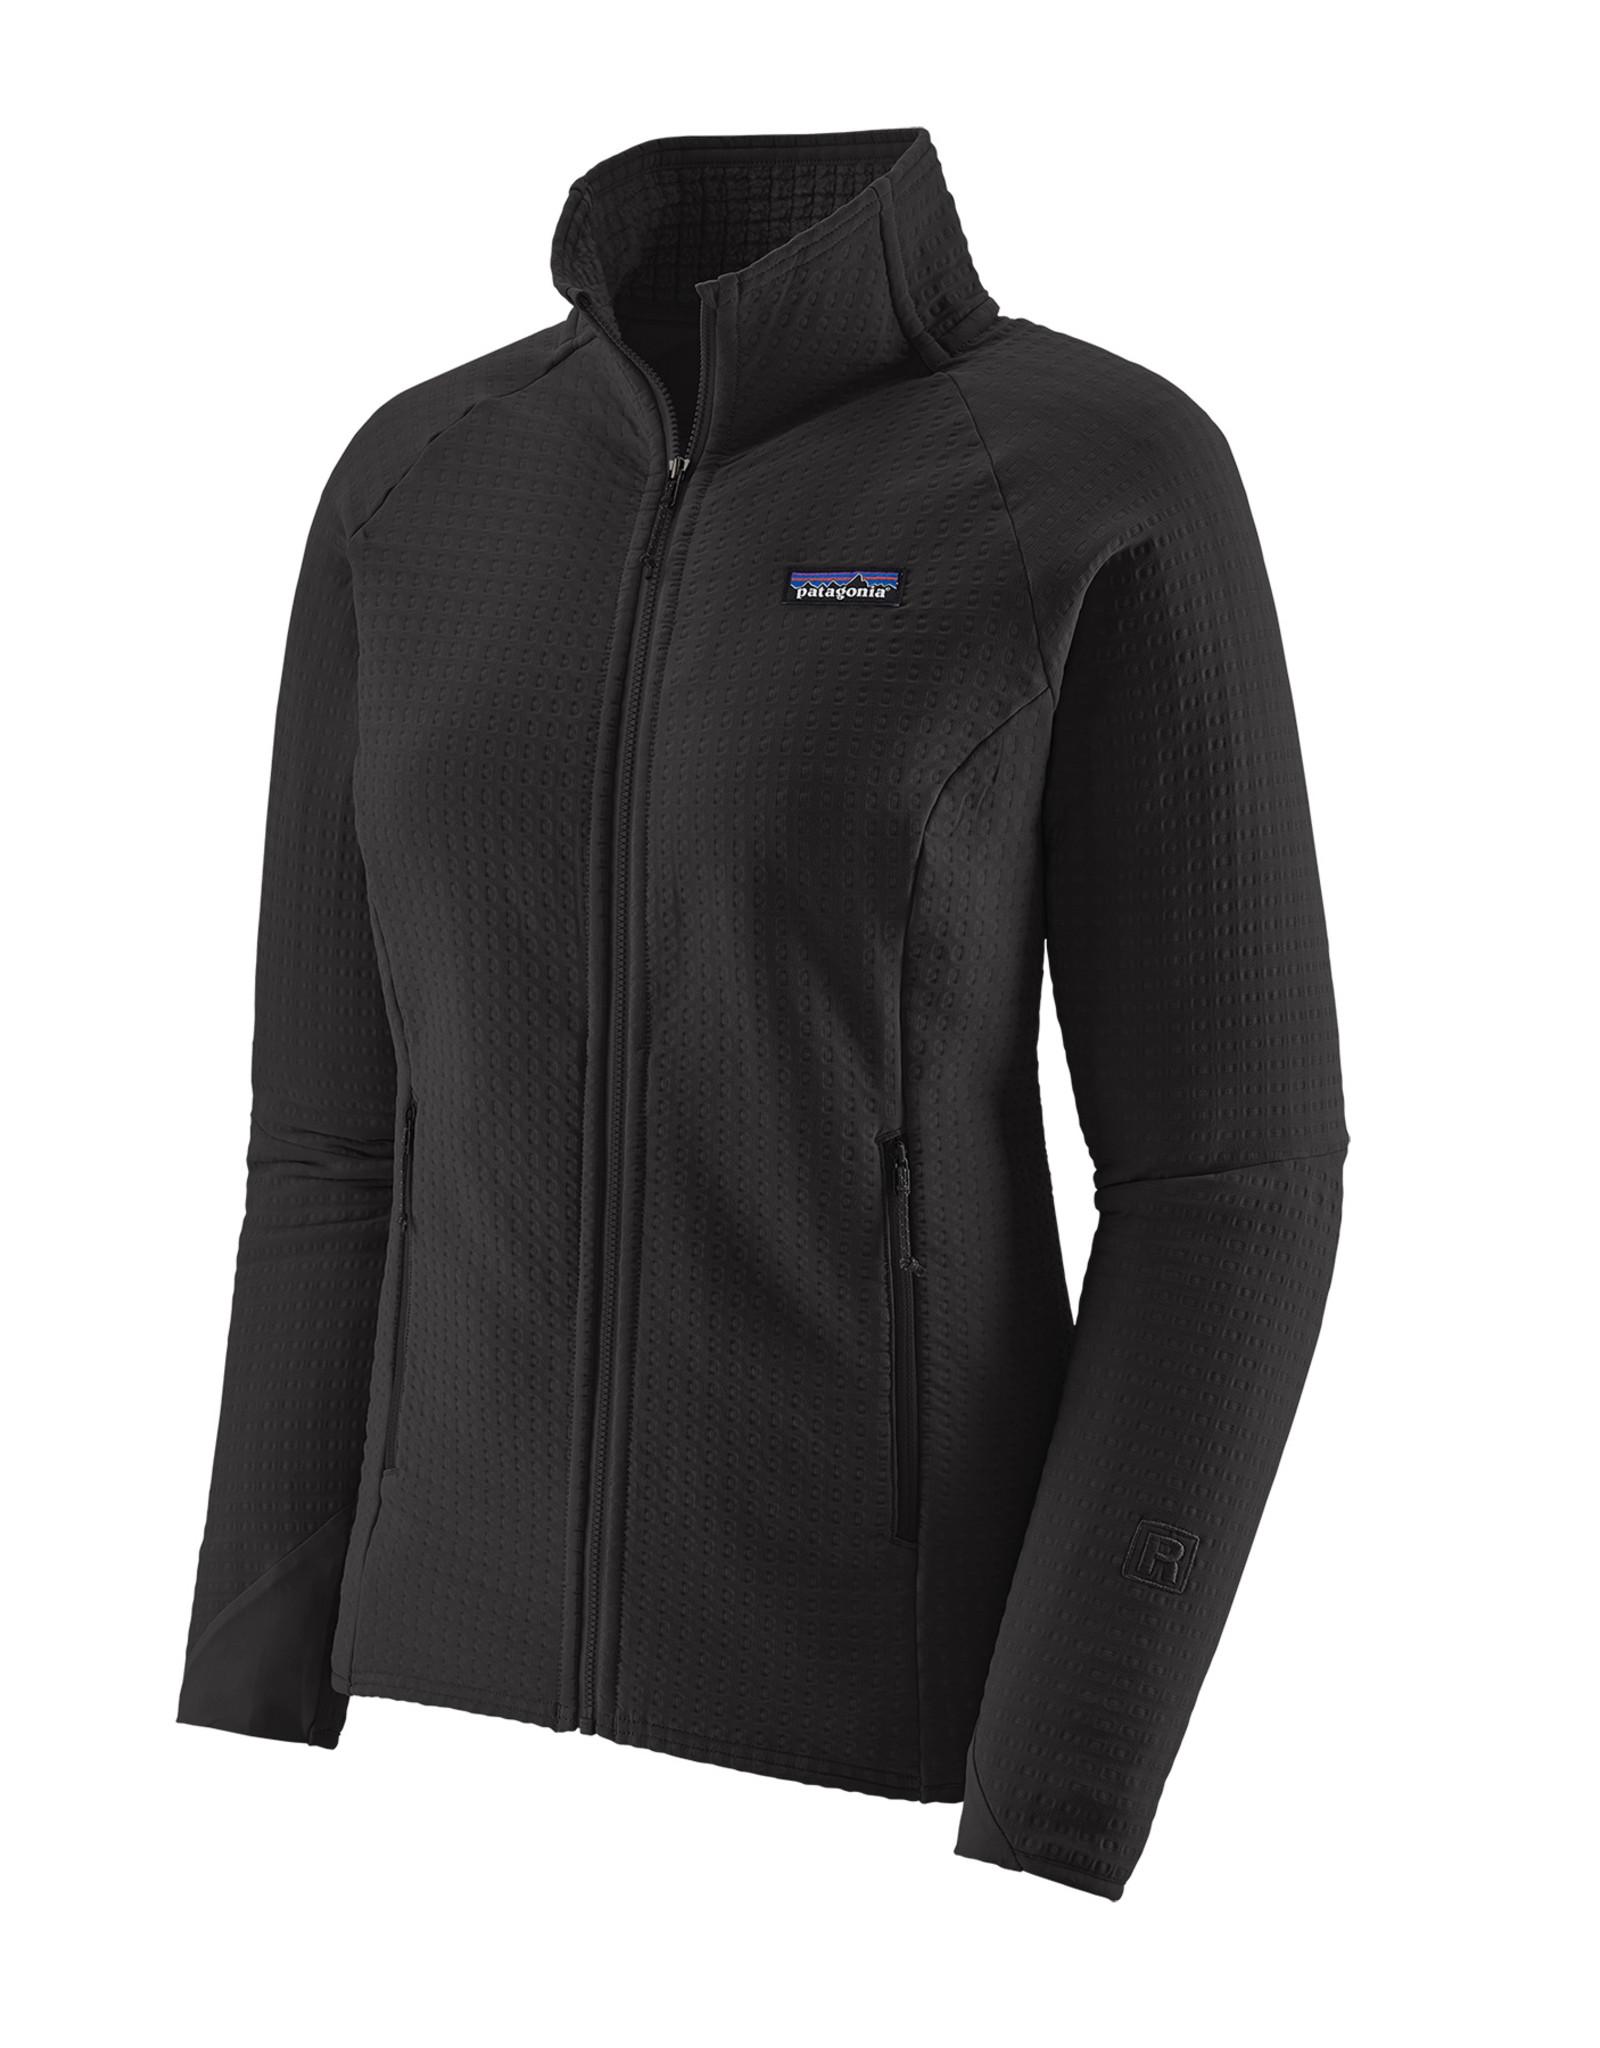 patagonia R2 Techface jacket dames 83630